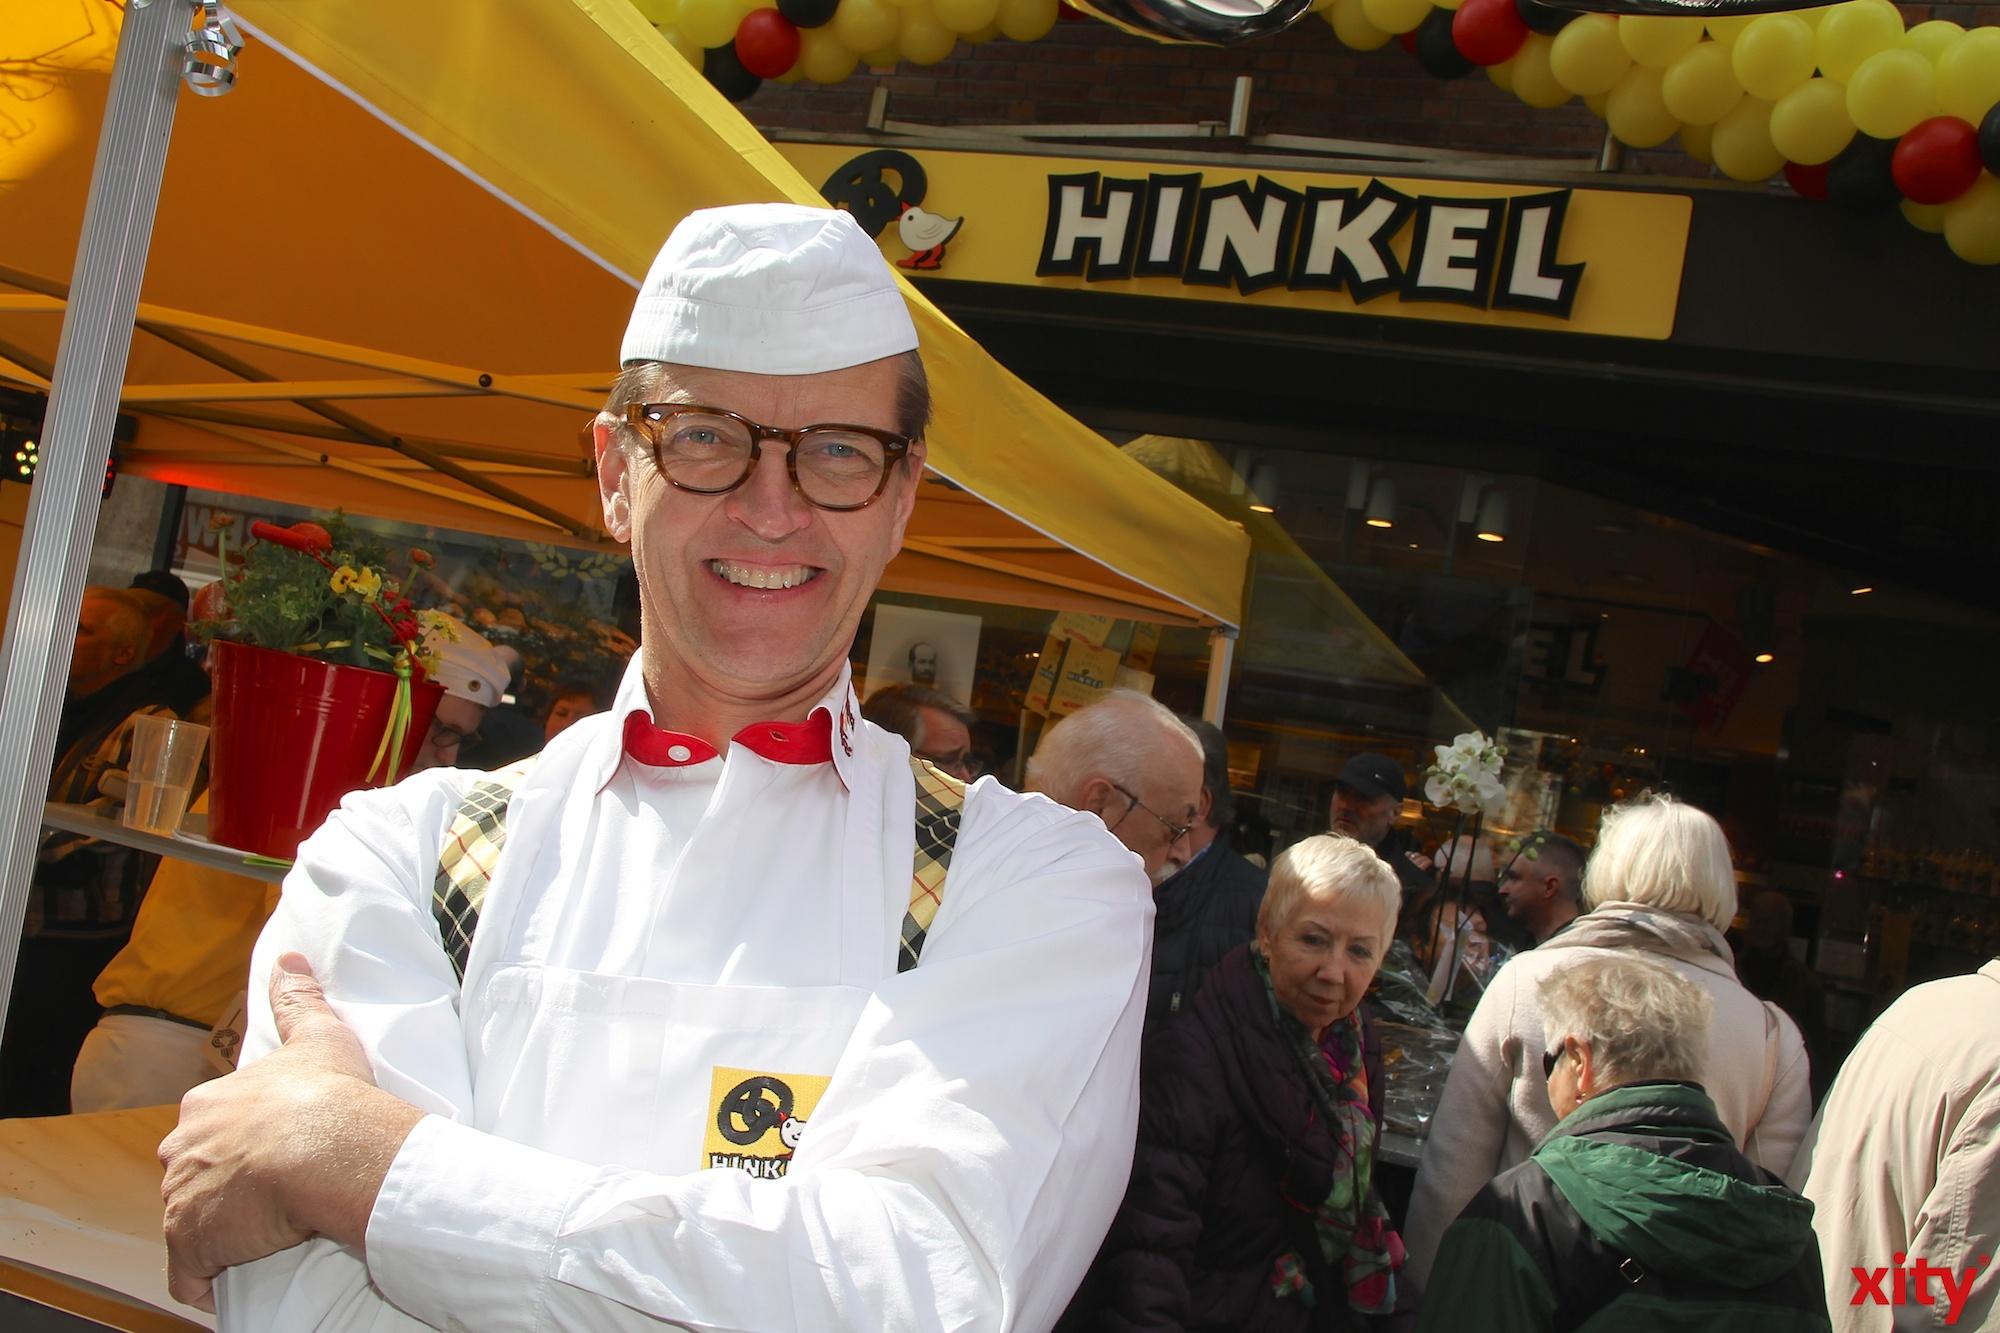 Josef Hinkel leitet den Familienbetrieb in vierter Generation (Foto: xity)